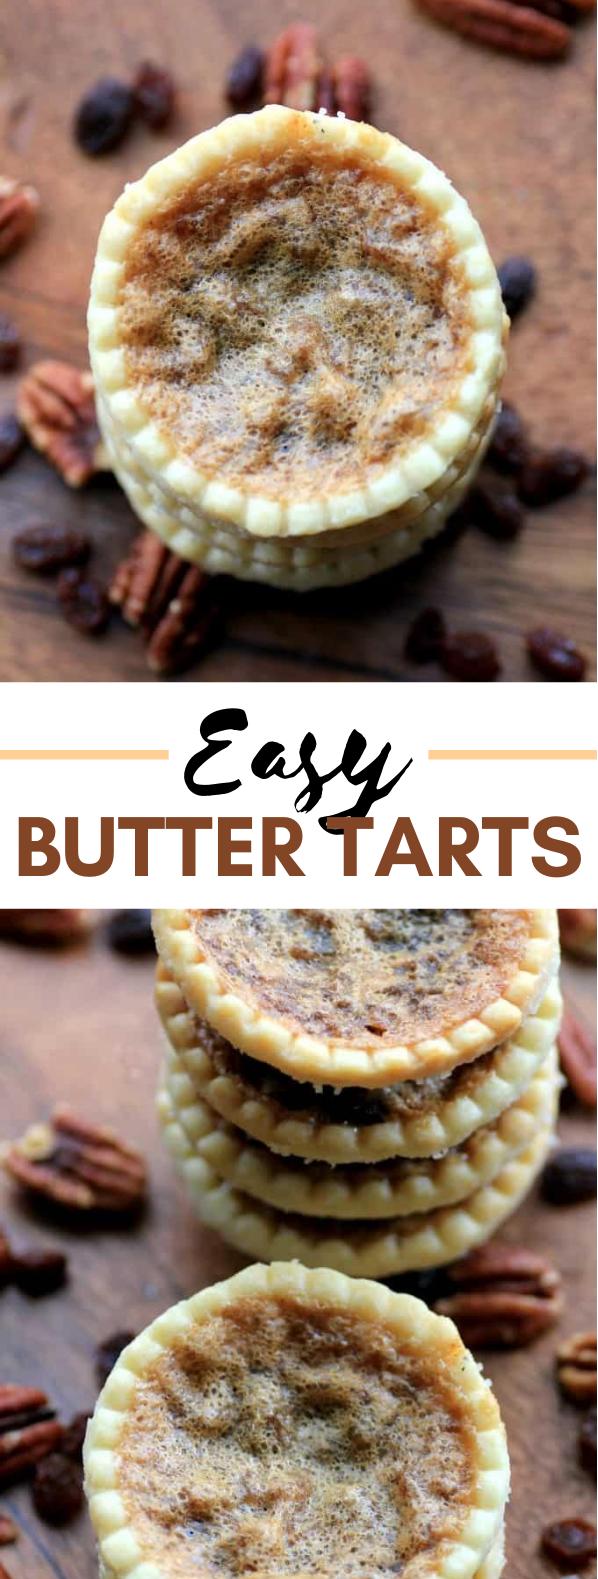 EASY BUTTER TARTS #desserts #cake #tarts #sweets #foodrecipe